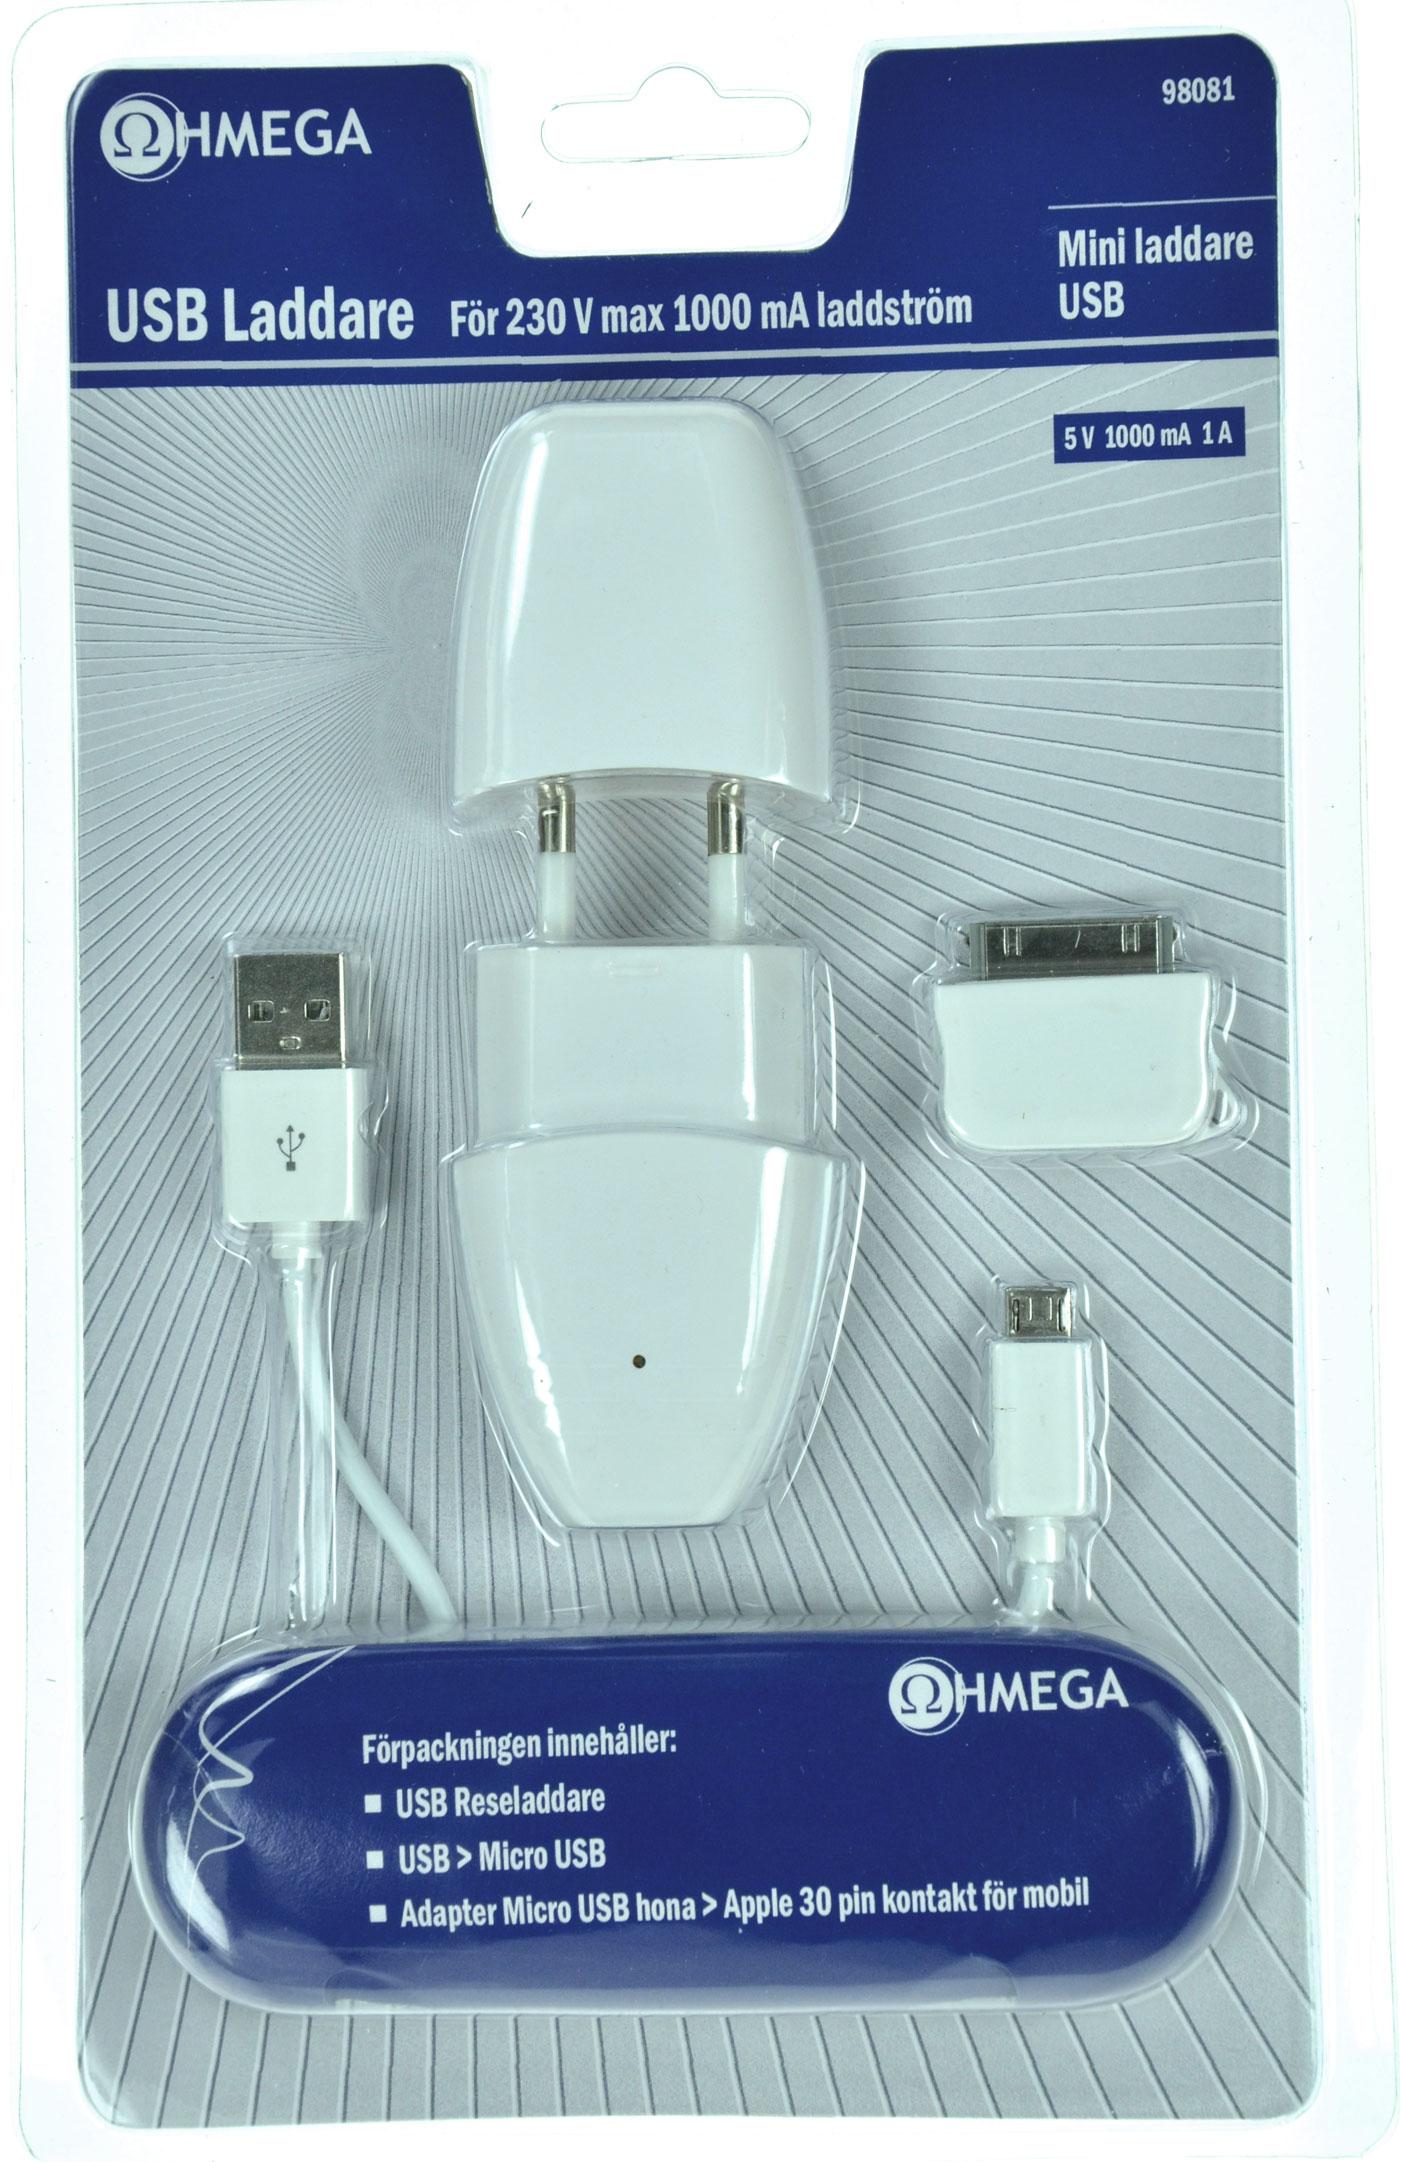 Ohmega Mobilladdare 230v USB-